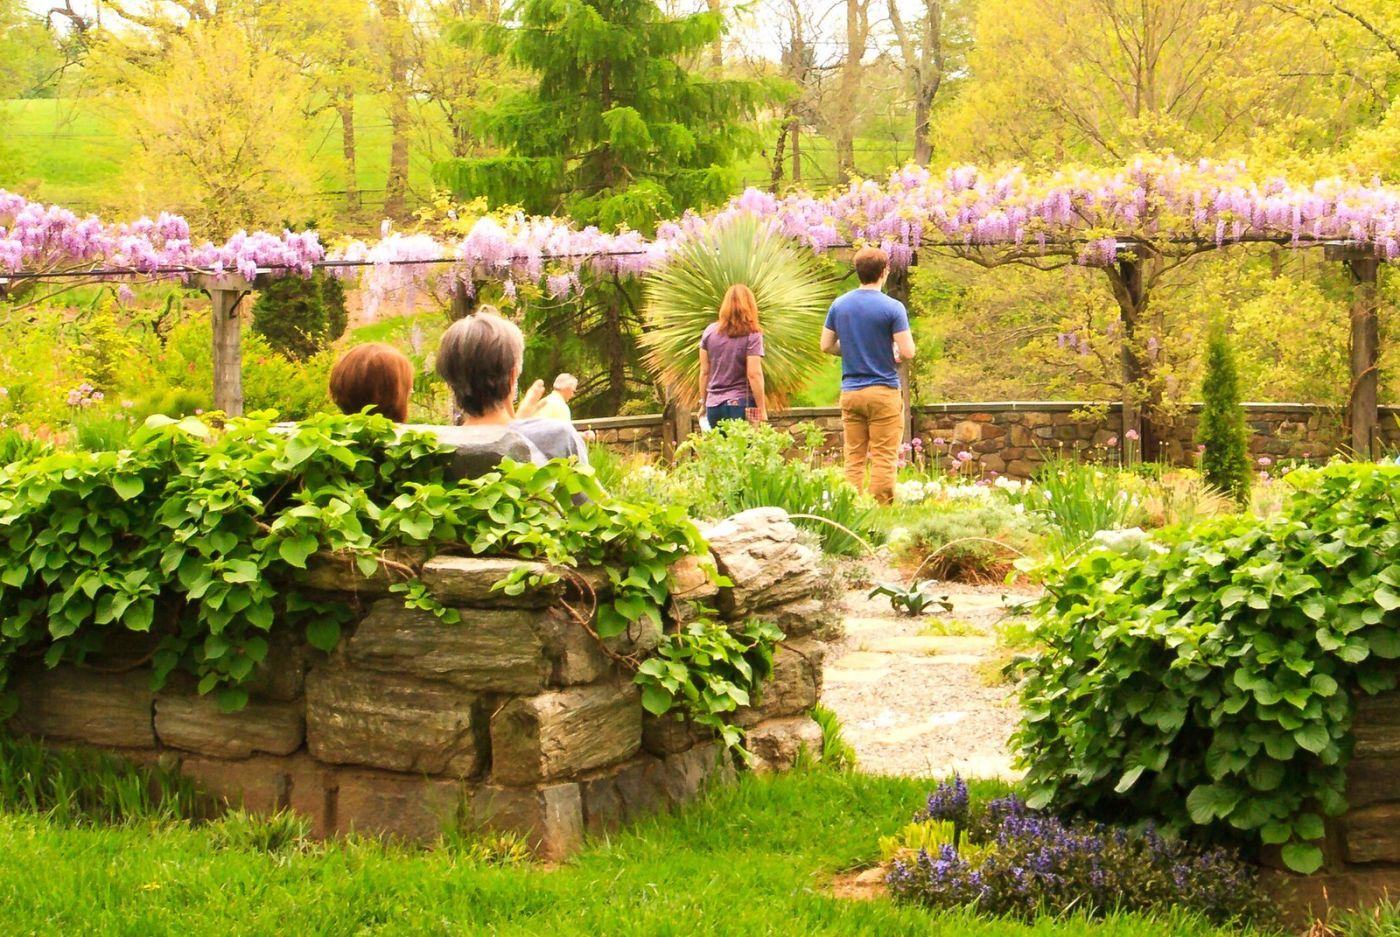 Chanticleer花园,那年盛开的紫藤花_图1-28